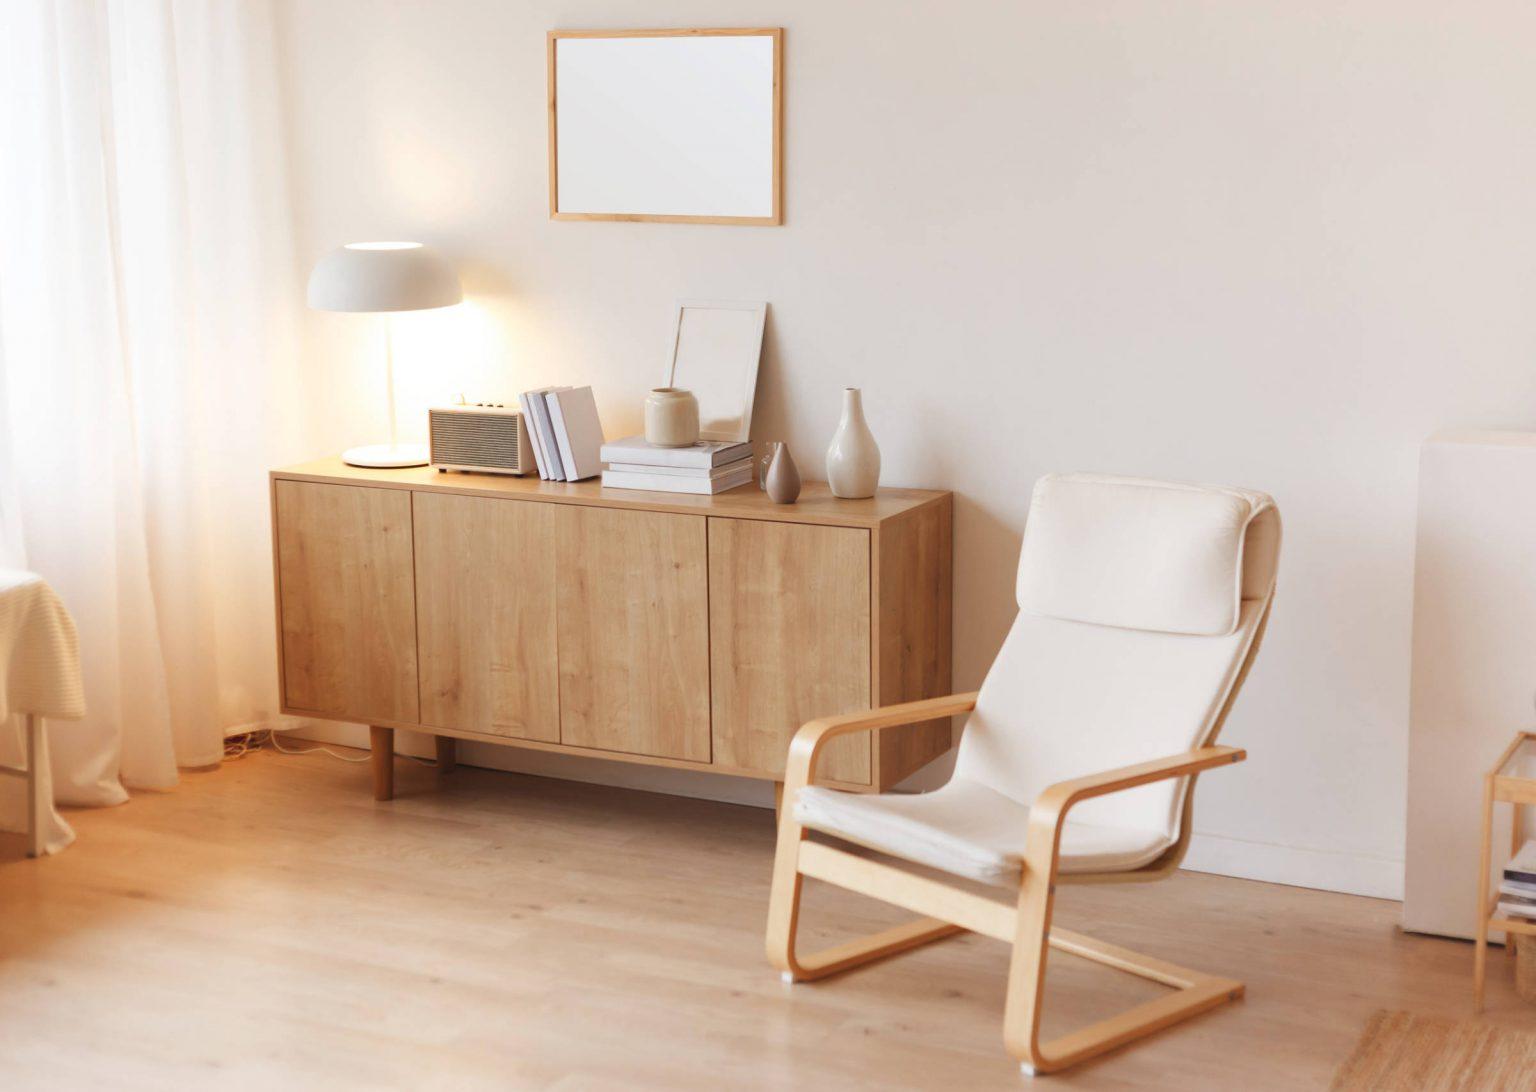 modern-minimalistic-interior-with-chest-of-drawers-CJT9HR3.jpg